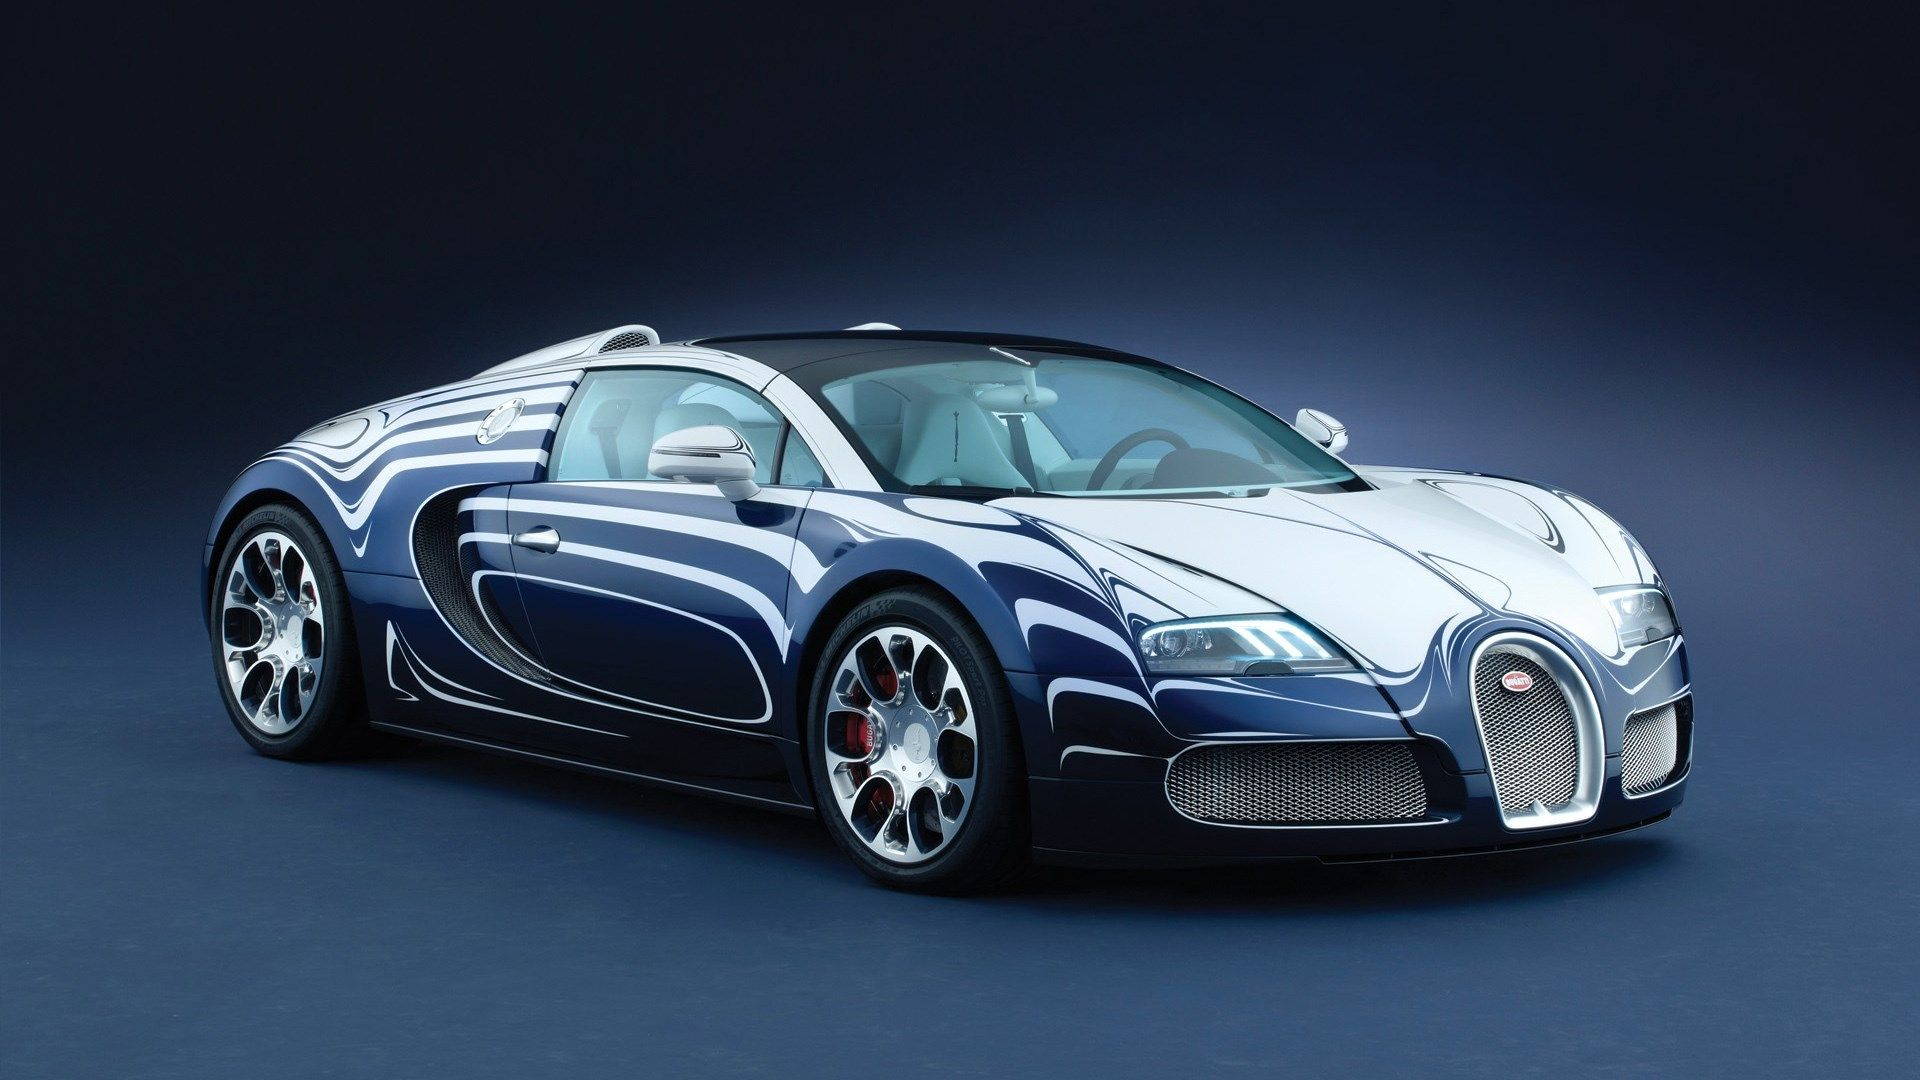 Superbe Bugatti Veyron Super Sport Image Full Hd, 793 KB   Dudu Fletcher